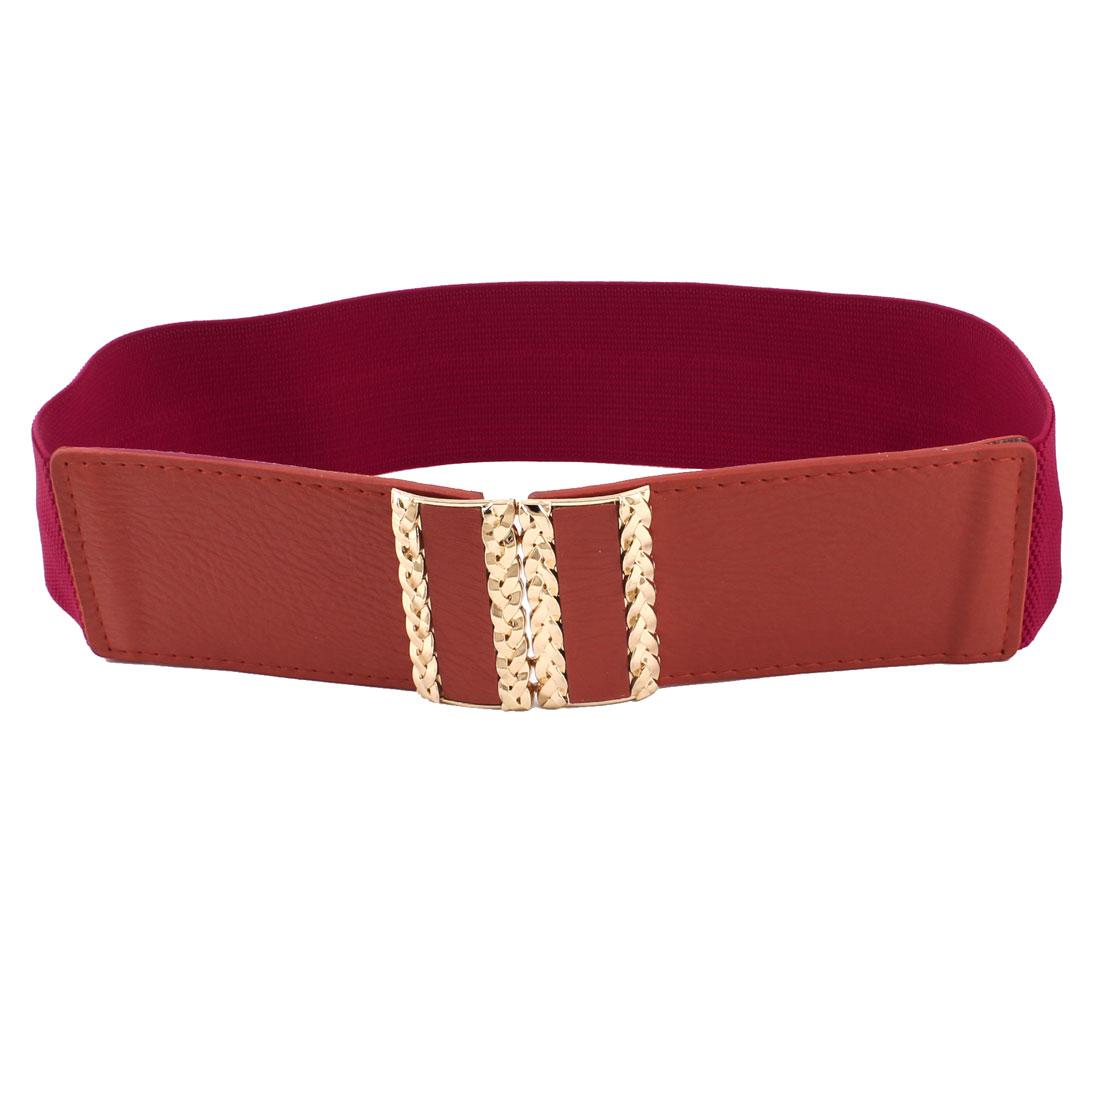 Woman Lady Interlock Buckle 6cm Width Elastic Blouse Ornament Waistbelt Red